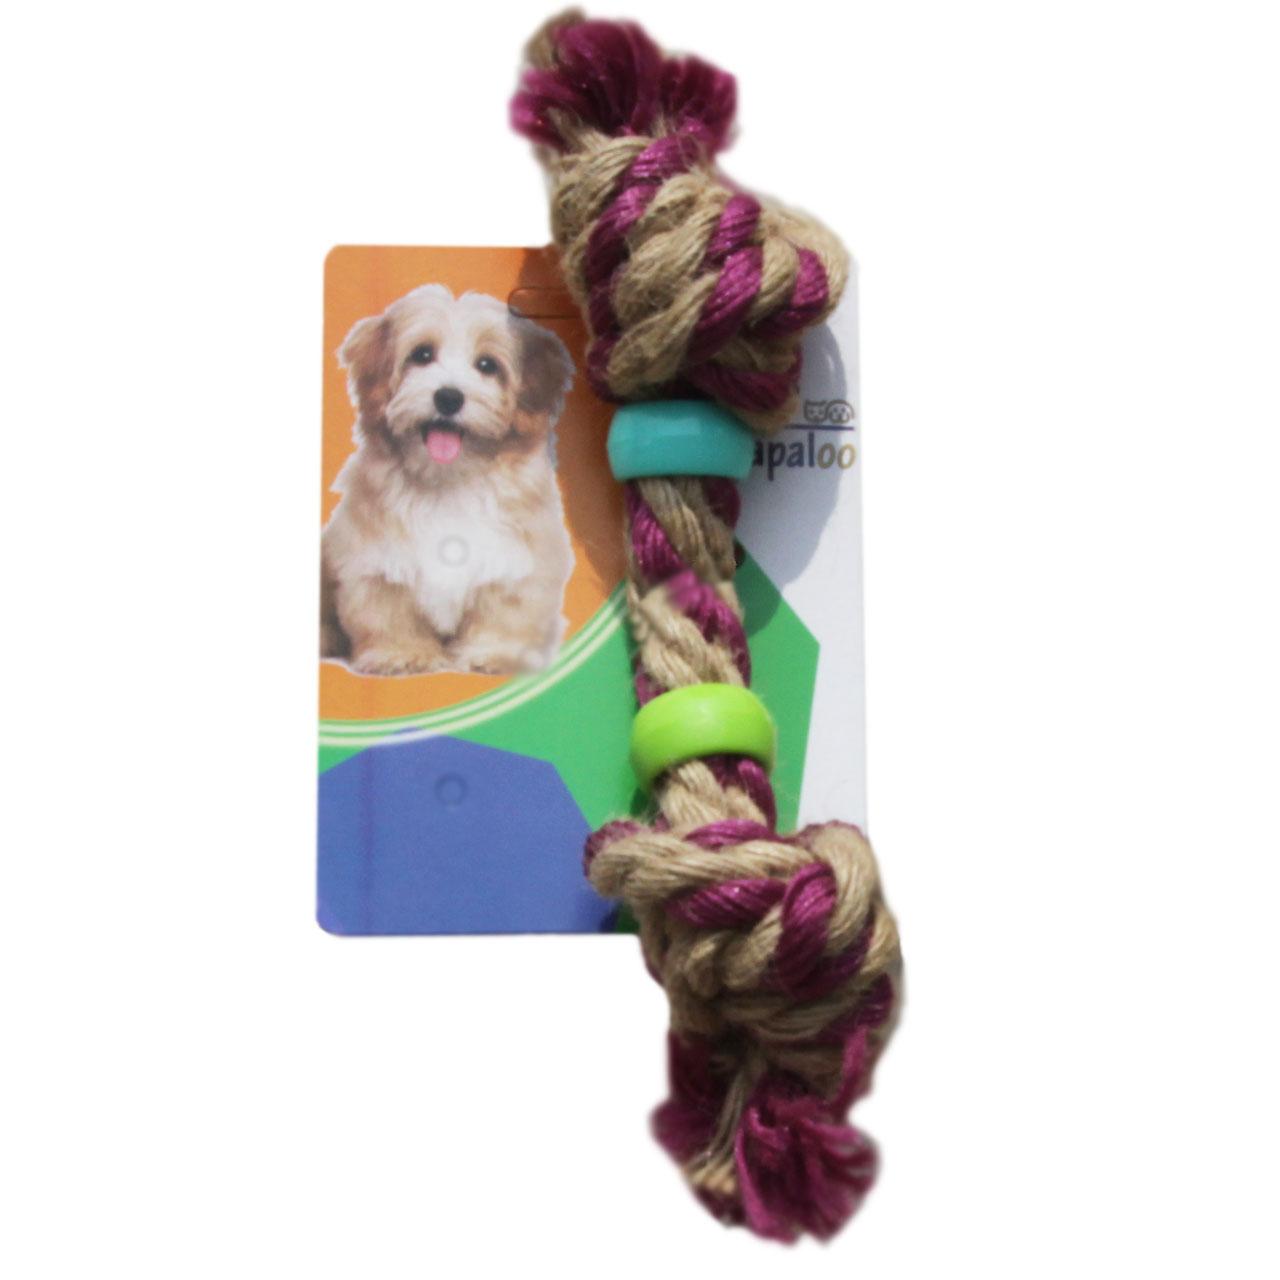 اسباب بازی سگ مسترکاپالو مدل FK18CP